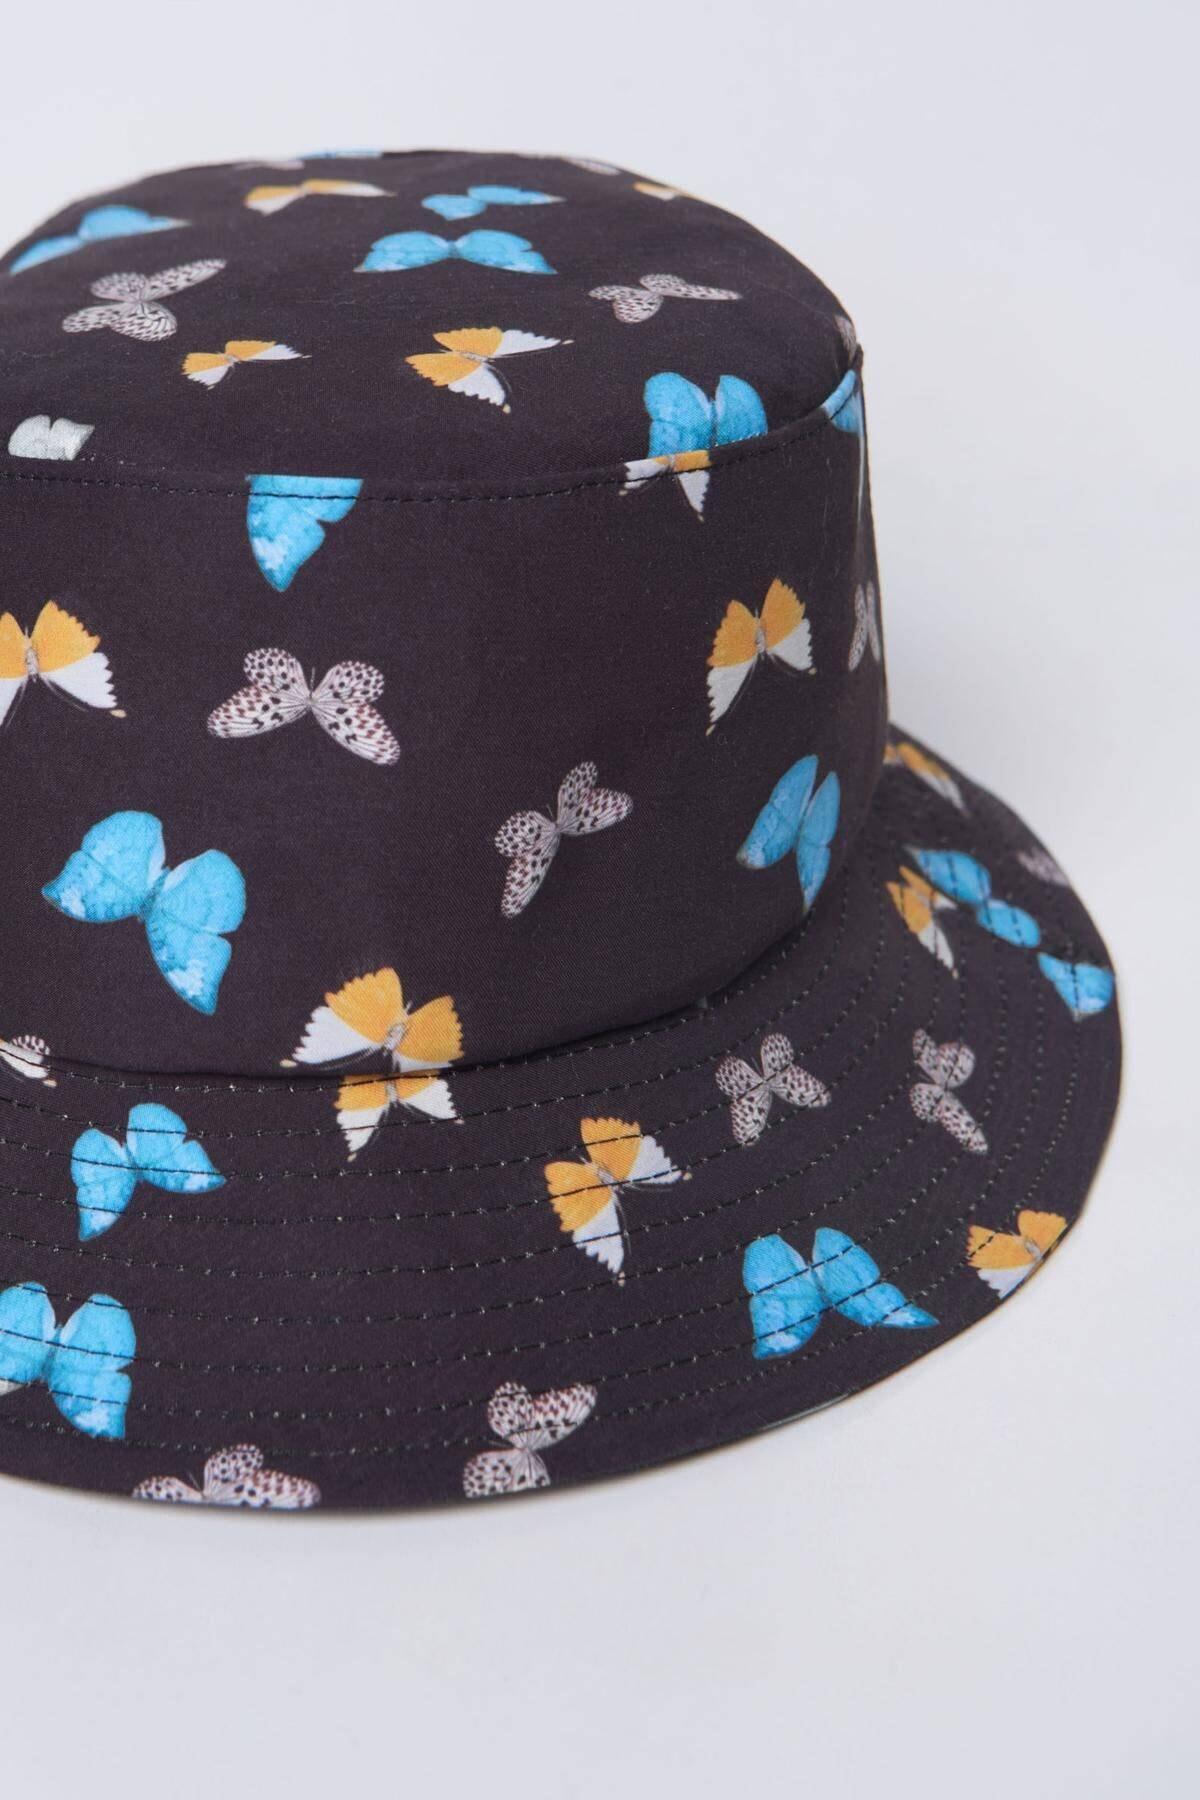 Addax Kadın Siyah Mavi Şapka Şpk1045 - E1 Adx-0000023856 4